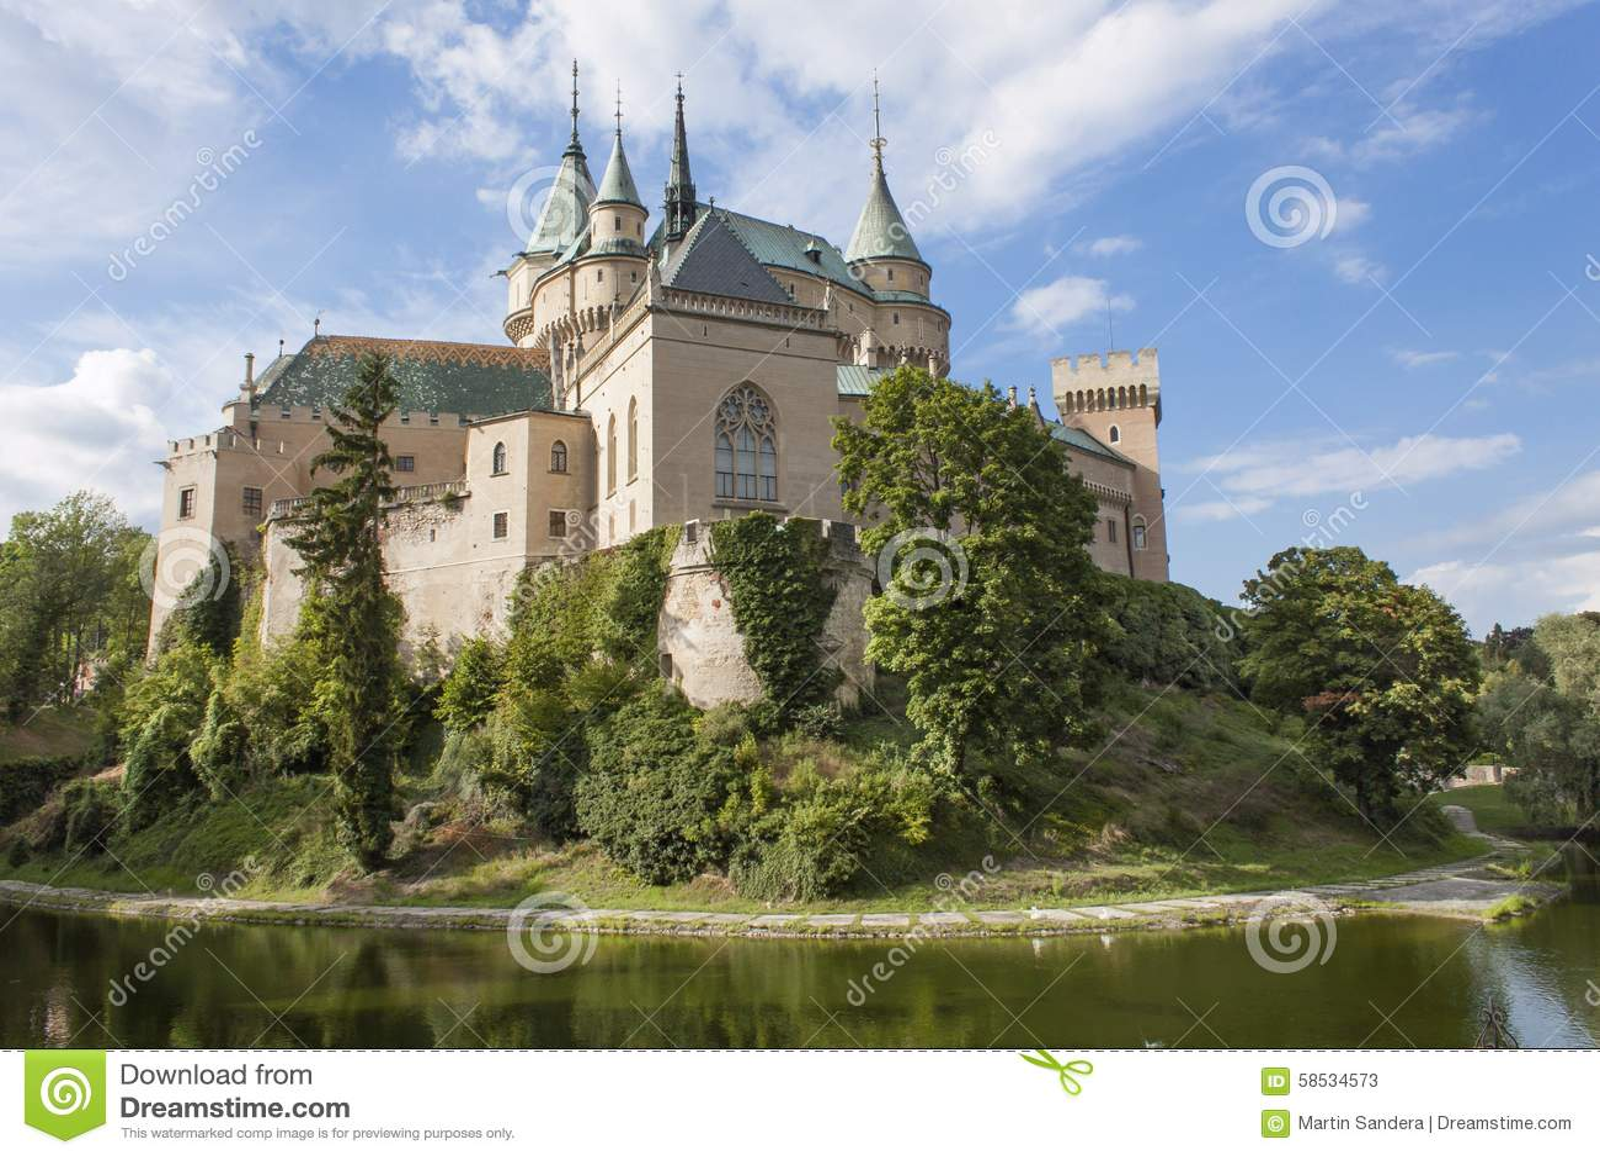 Historic castle Bojnice in the Slovak Republic.